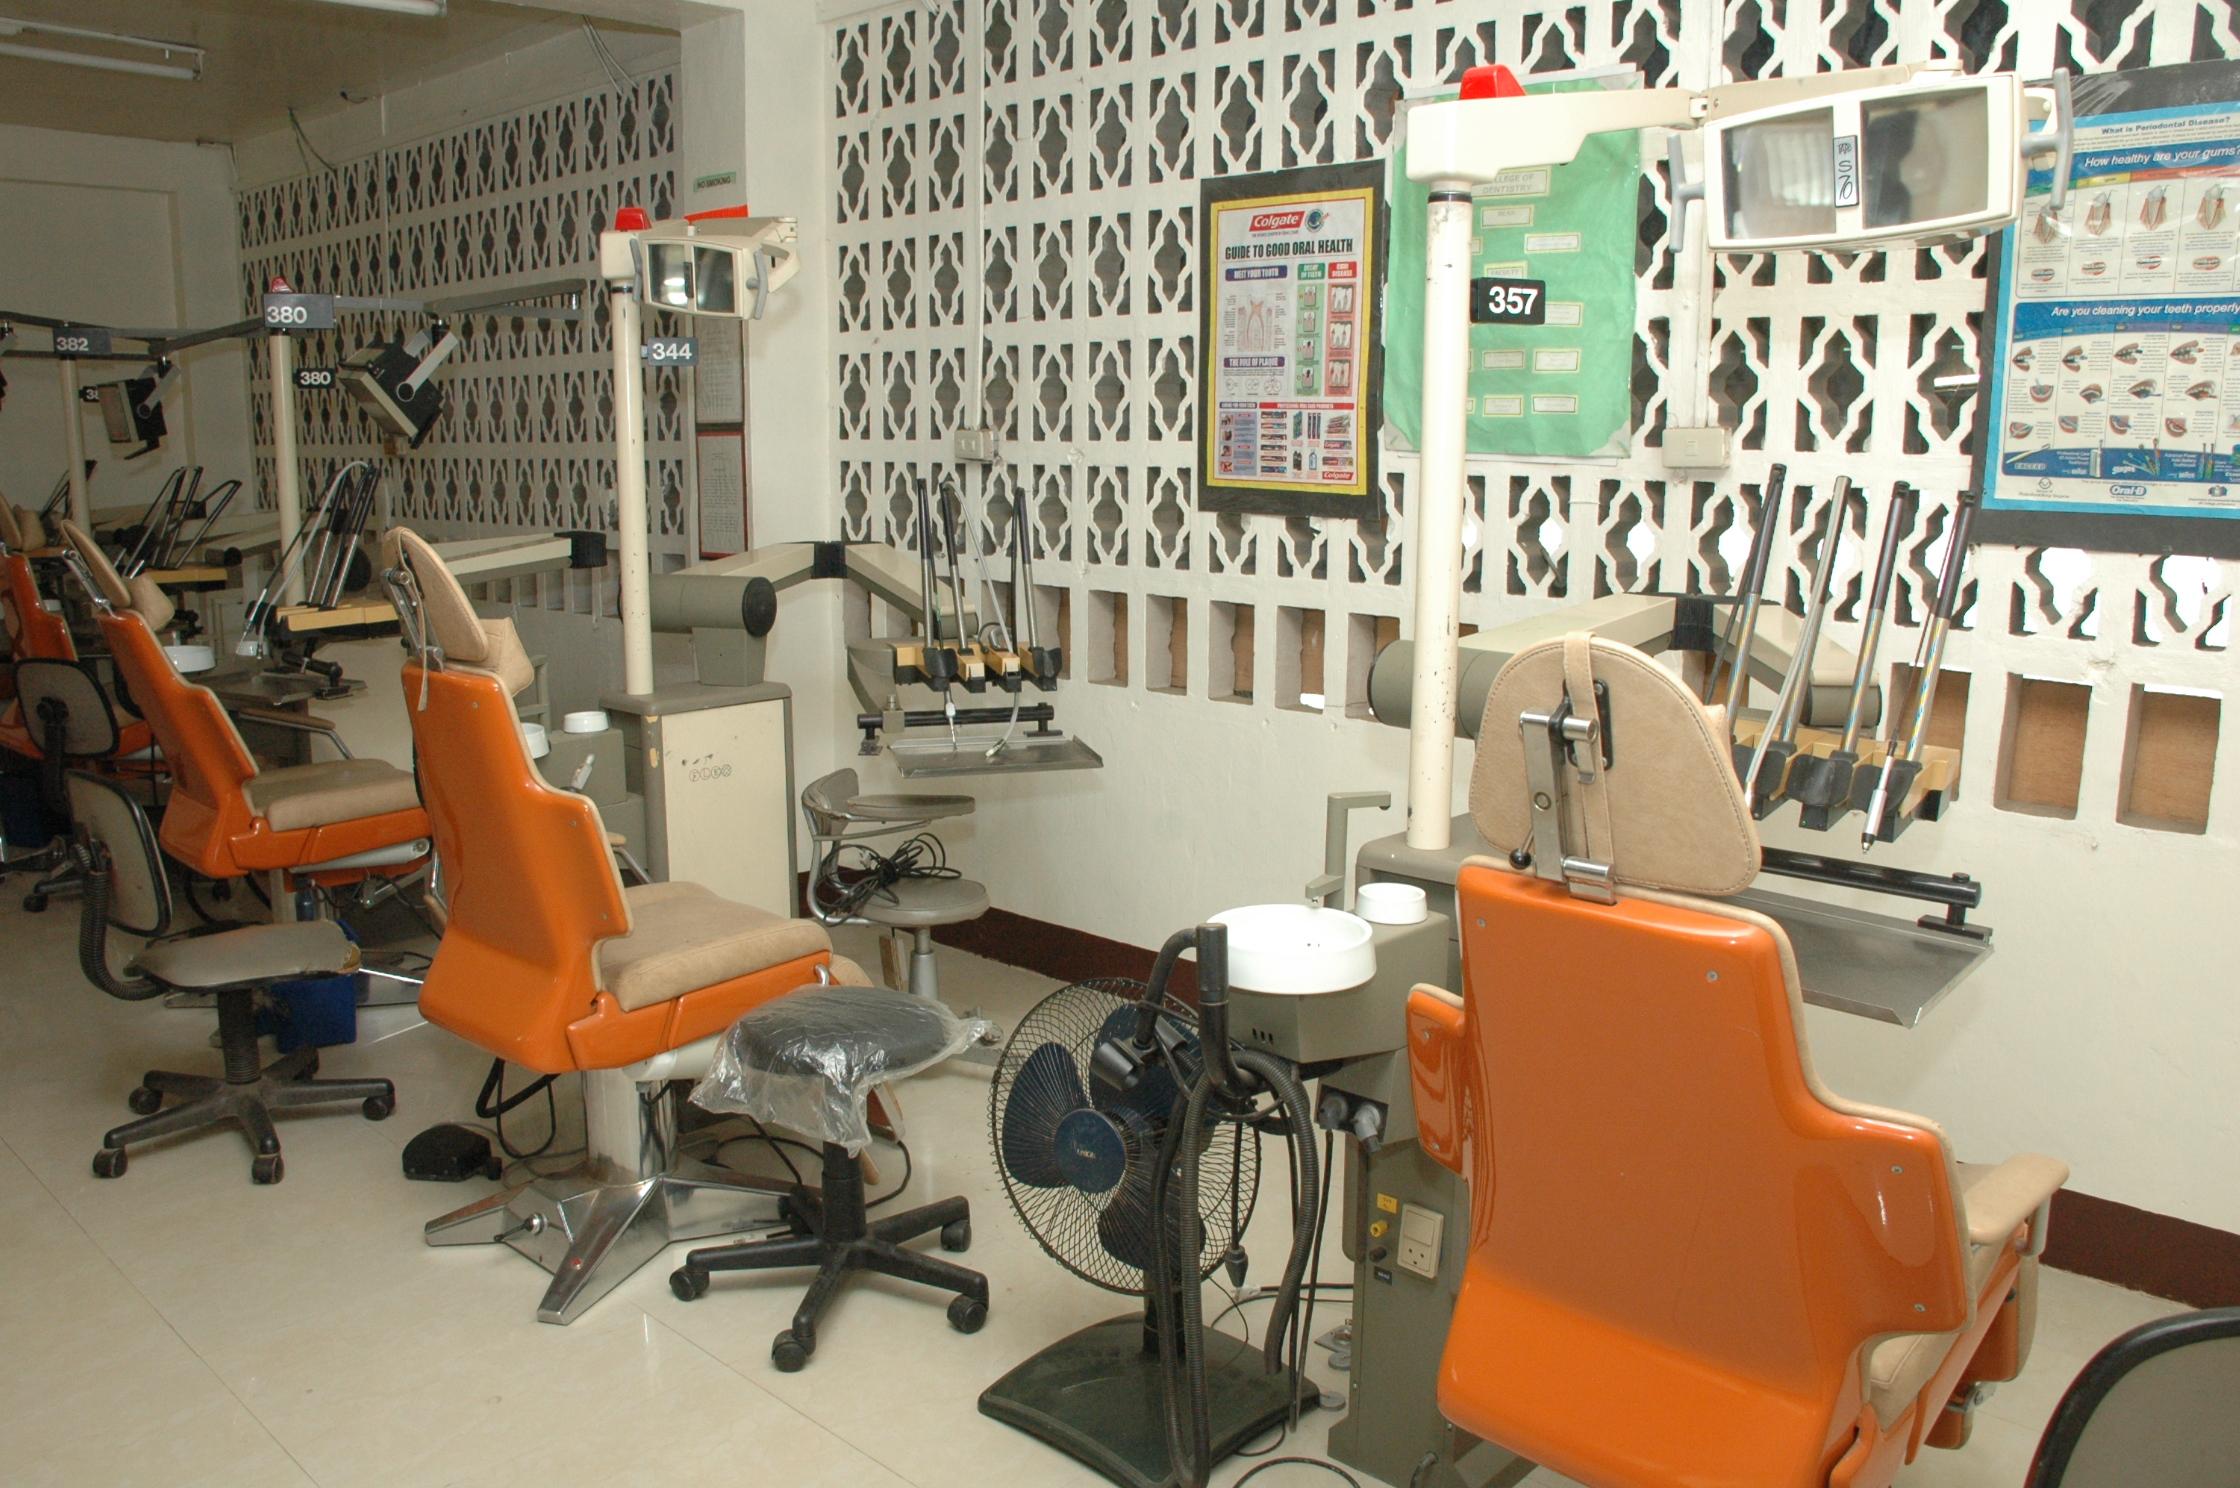 dentistry equipments